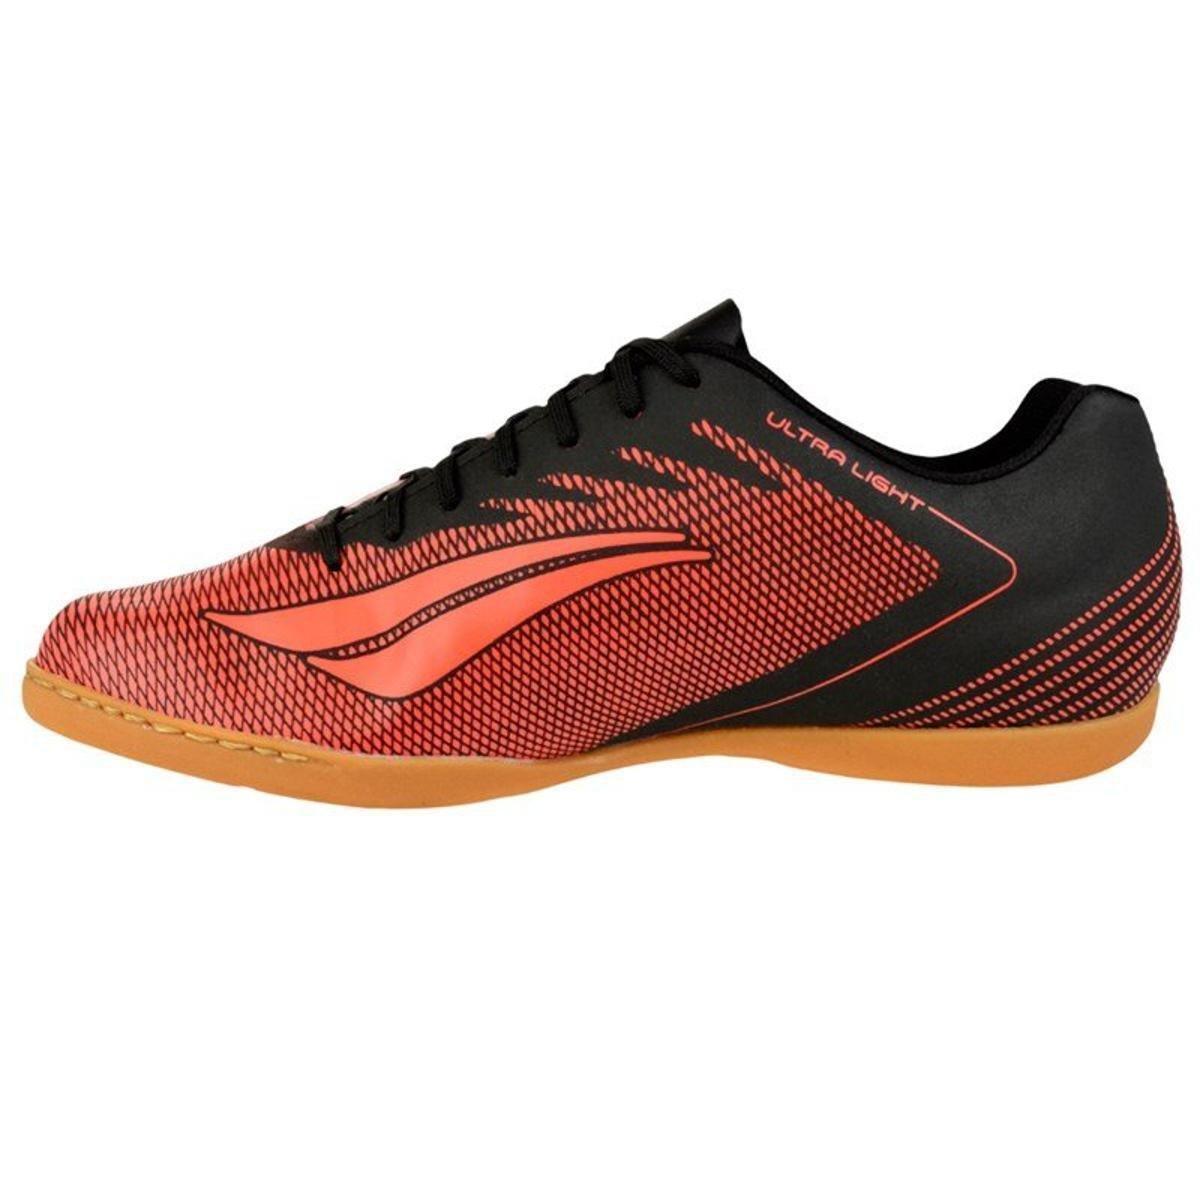 95e3938dc3 Tênis de Futsal Penalty Amazonas Masculino - Preto e Laranja ...